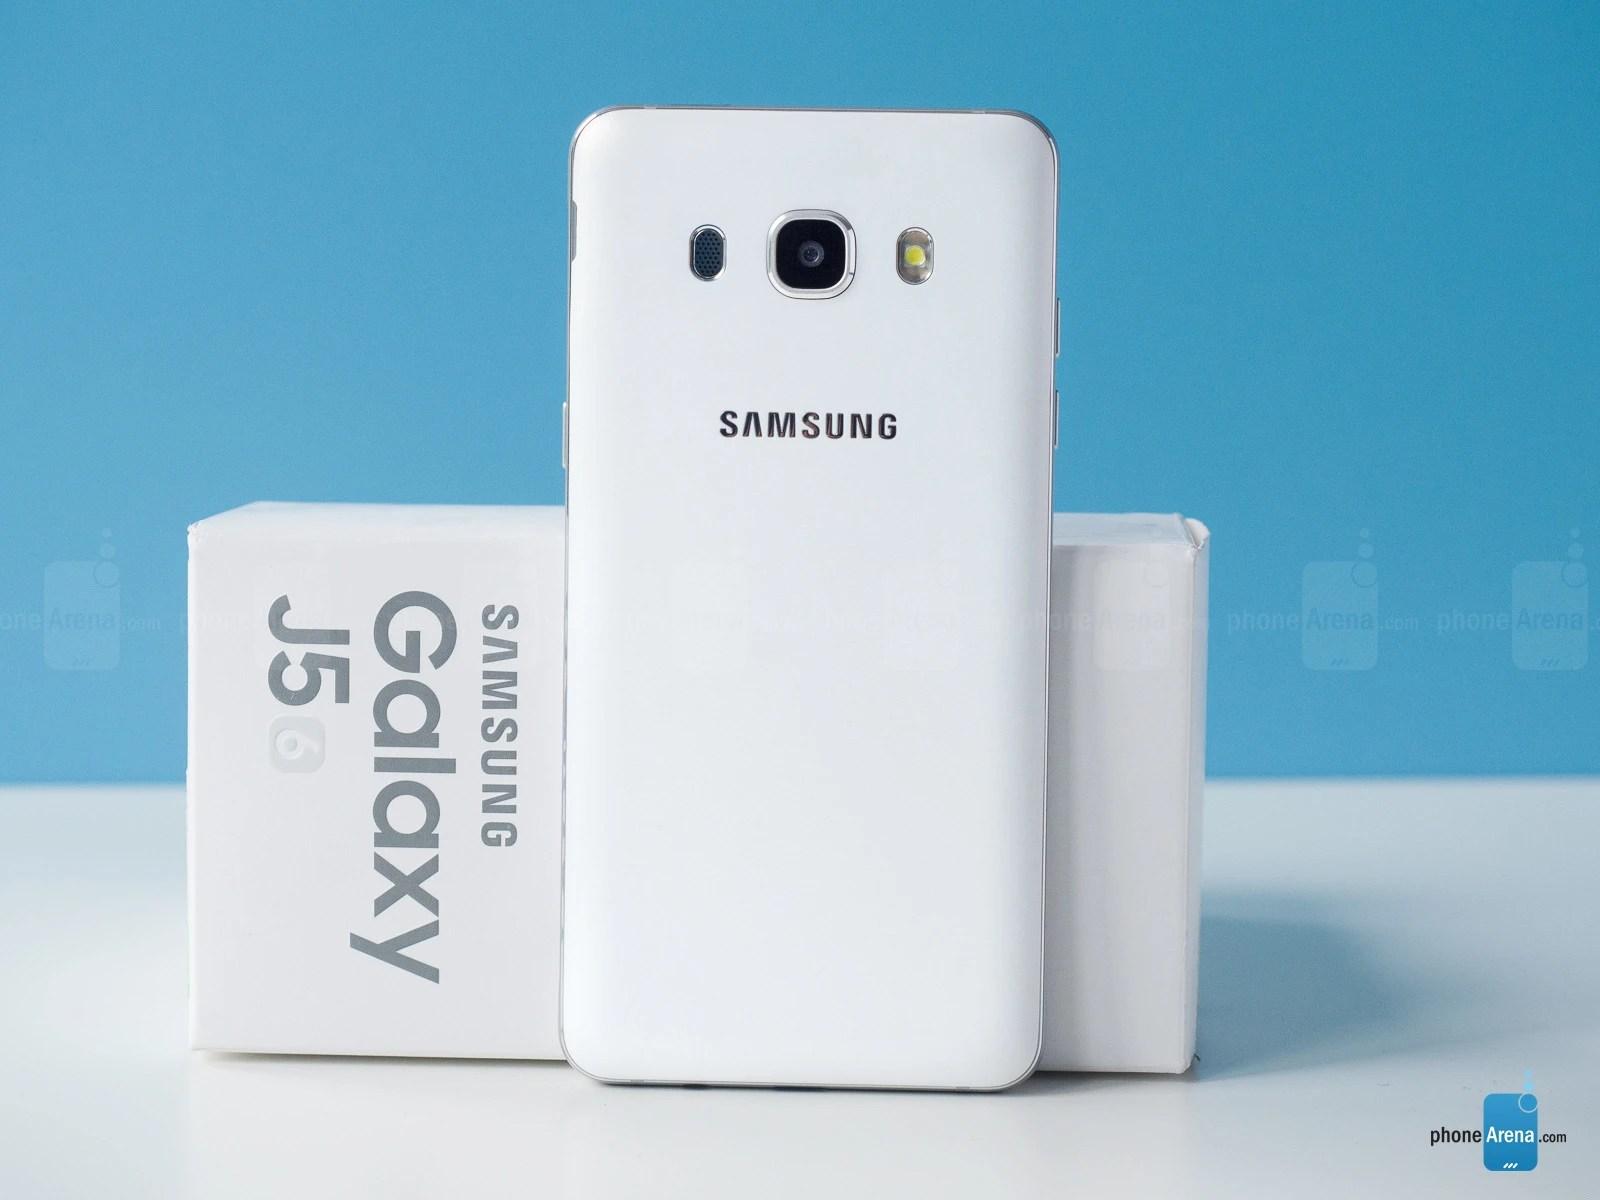 Samsung Galaxy S8 Wallpaper Hd Samsung Galaxy J5 2016 Review